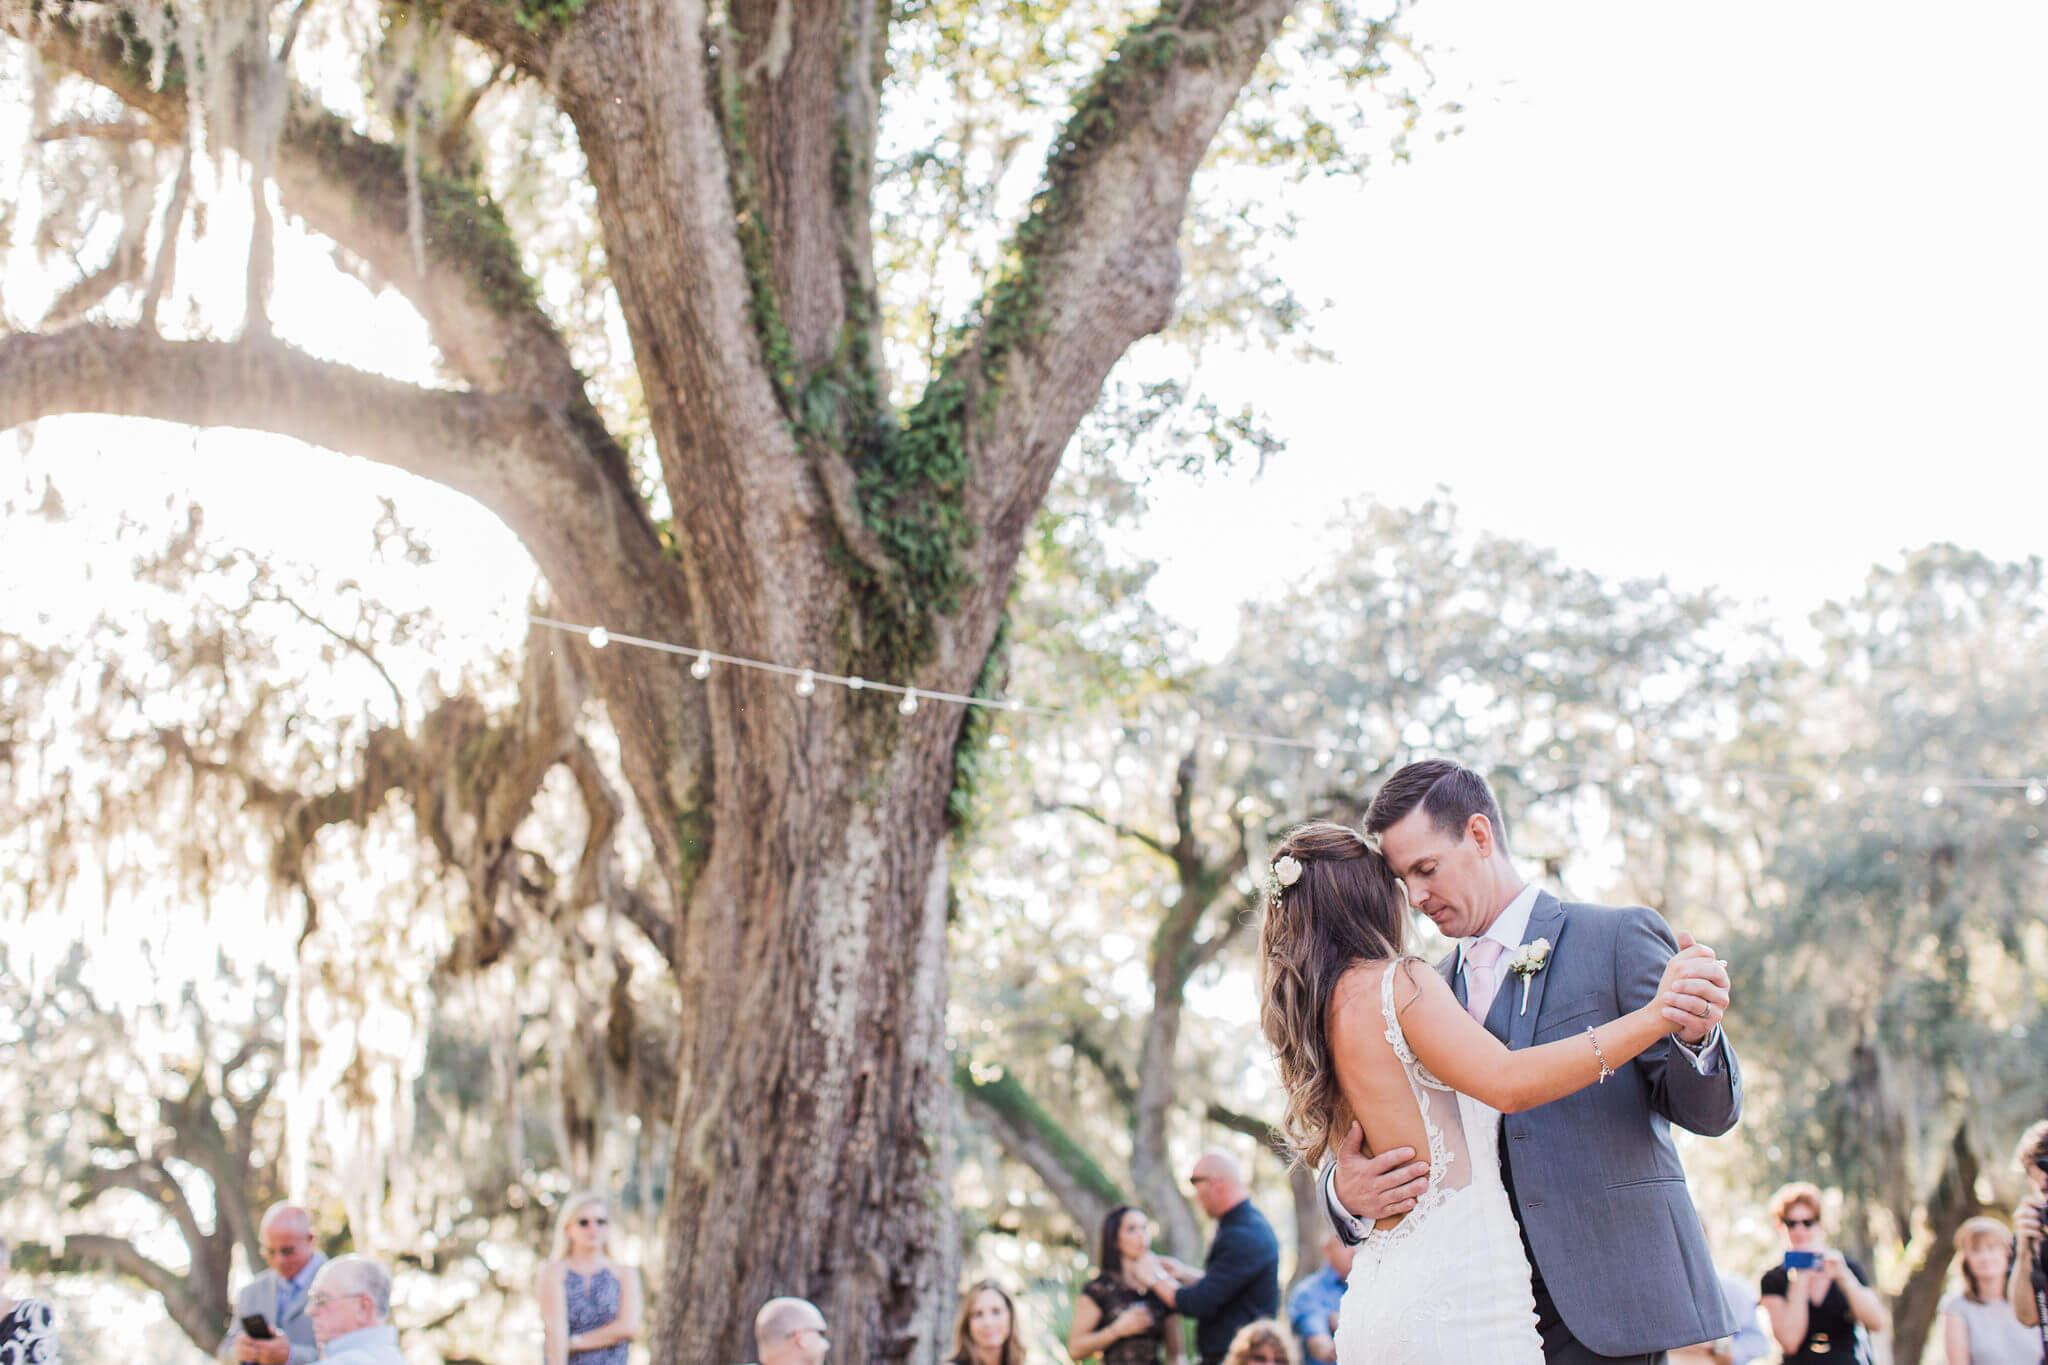 apt-b-photography-savannah-wedding-photographer-savannah-wedding-charleston-wedding-photographer-77.JPG